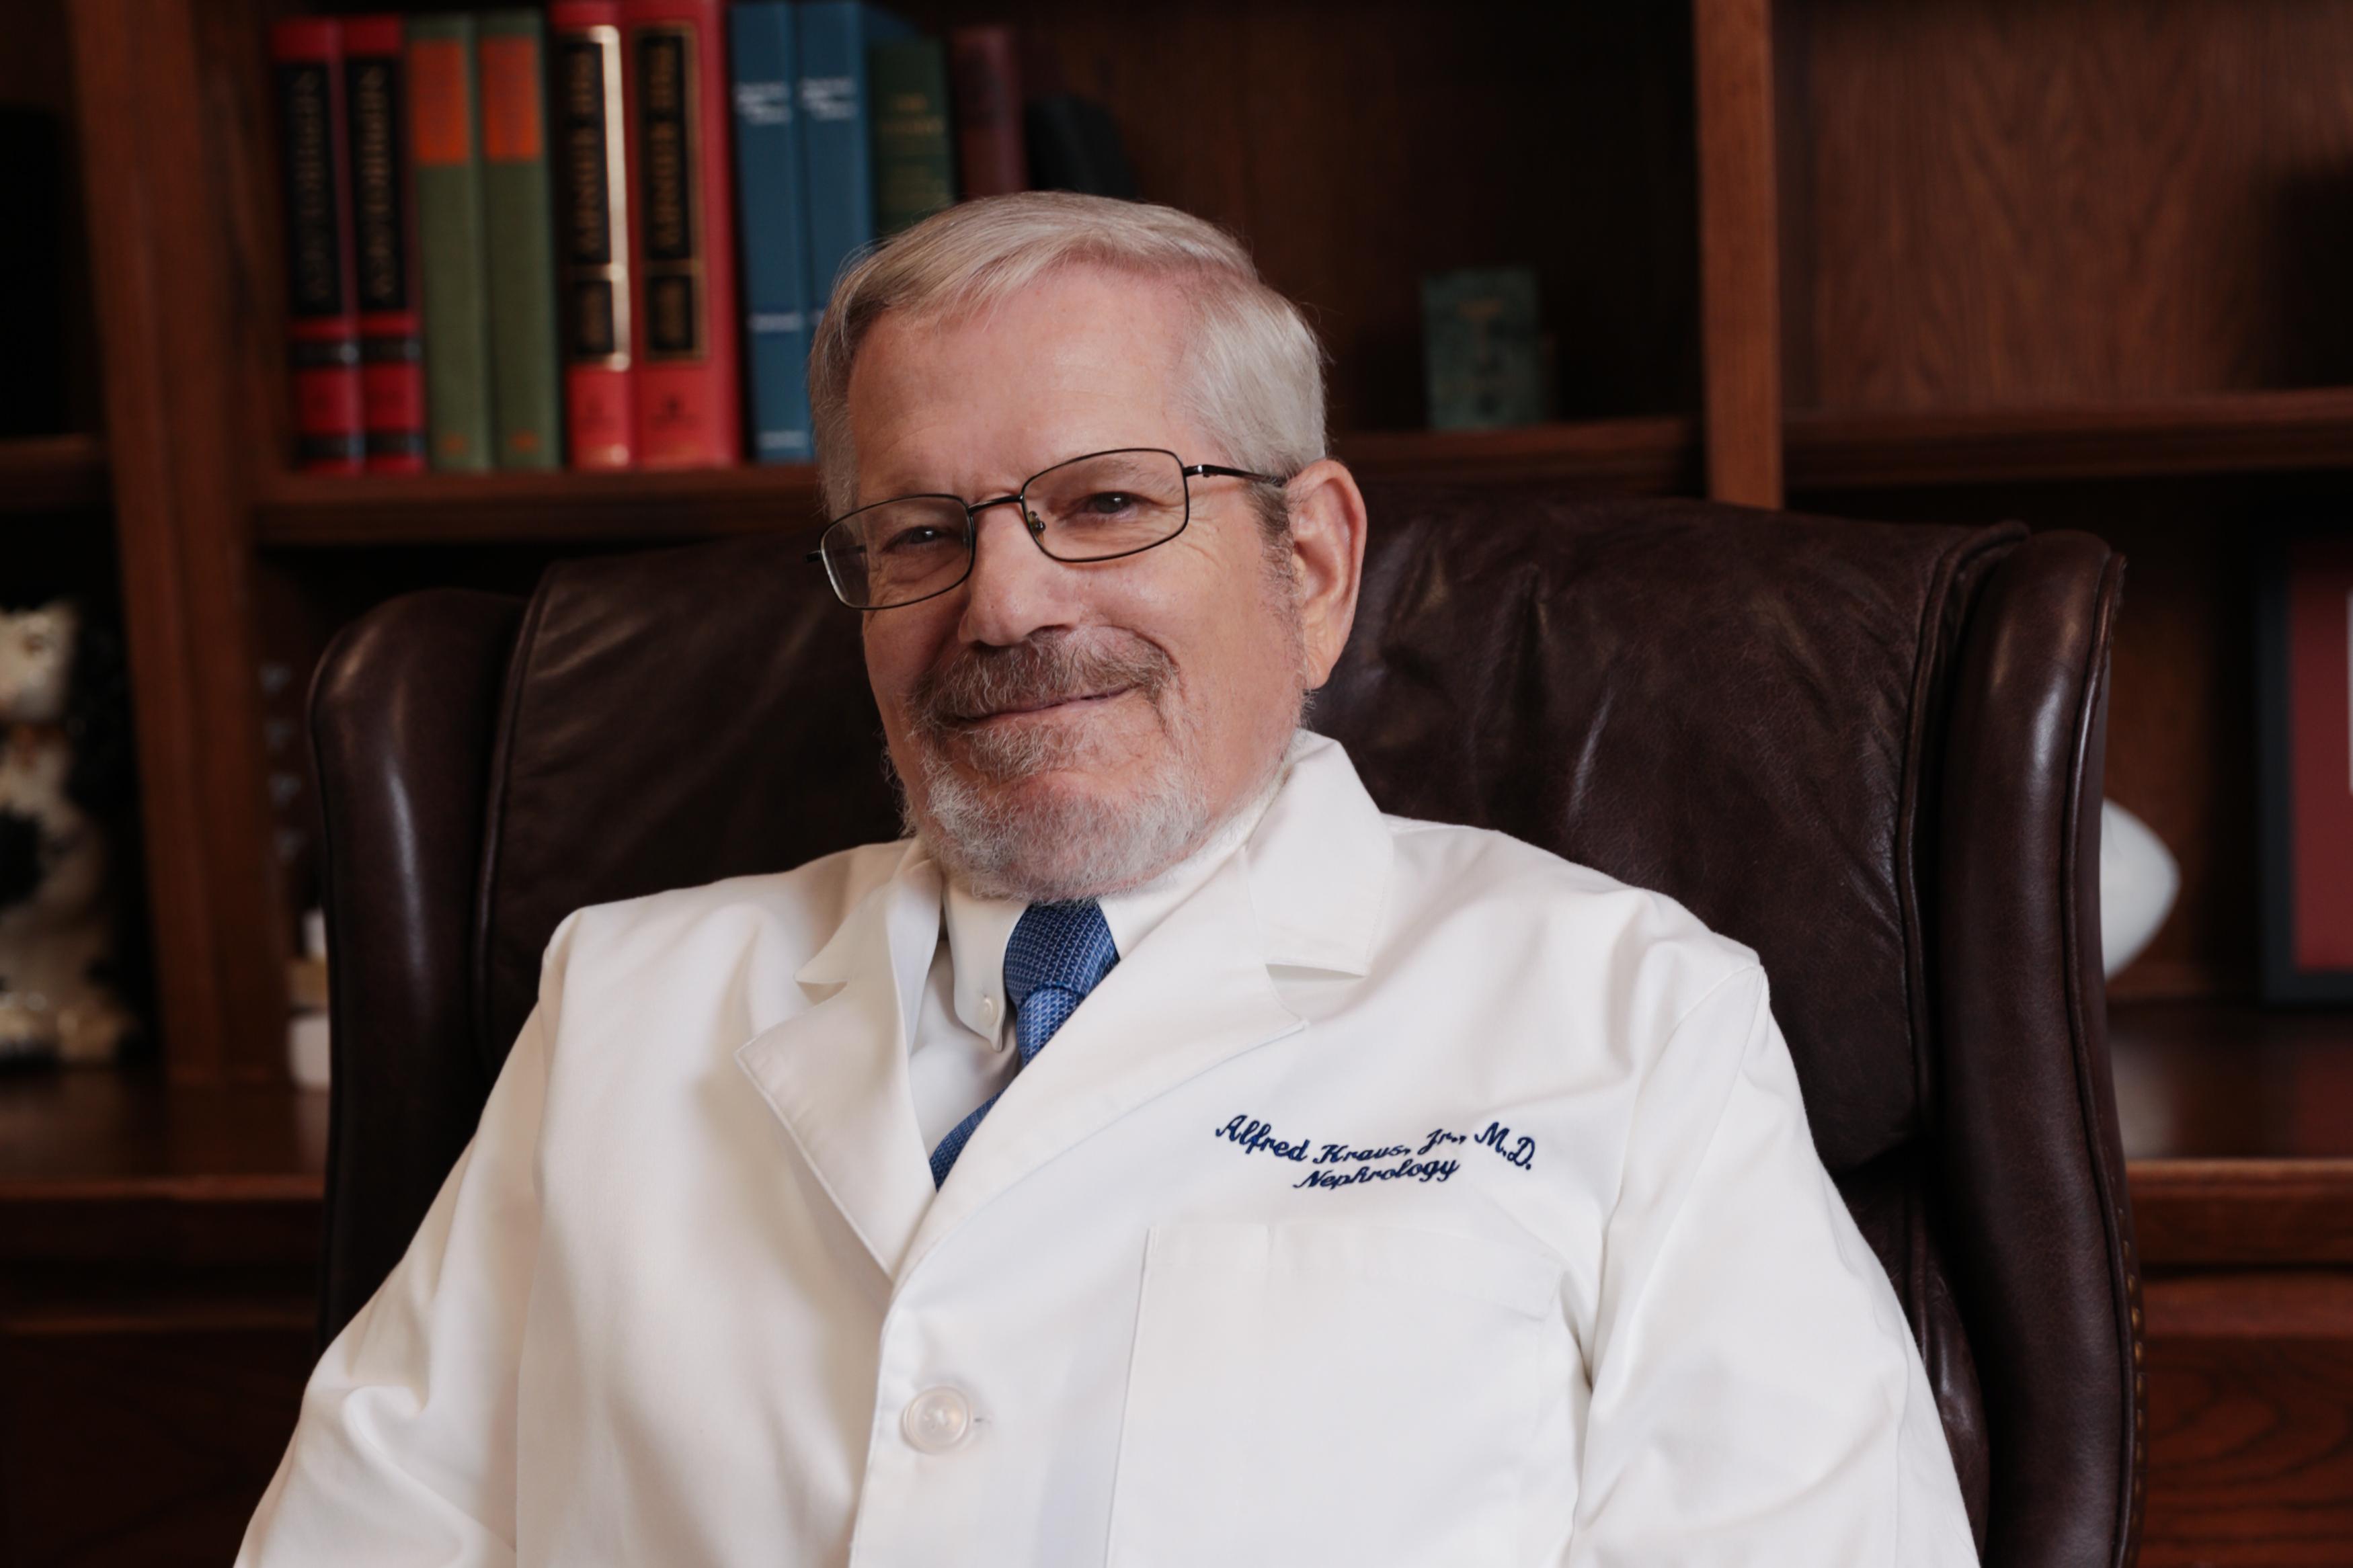 Alfred P. Kraus, Jr., MD